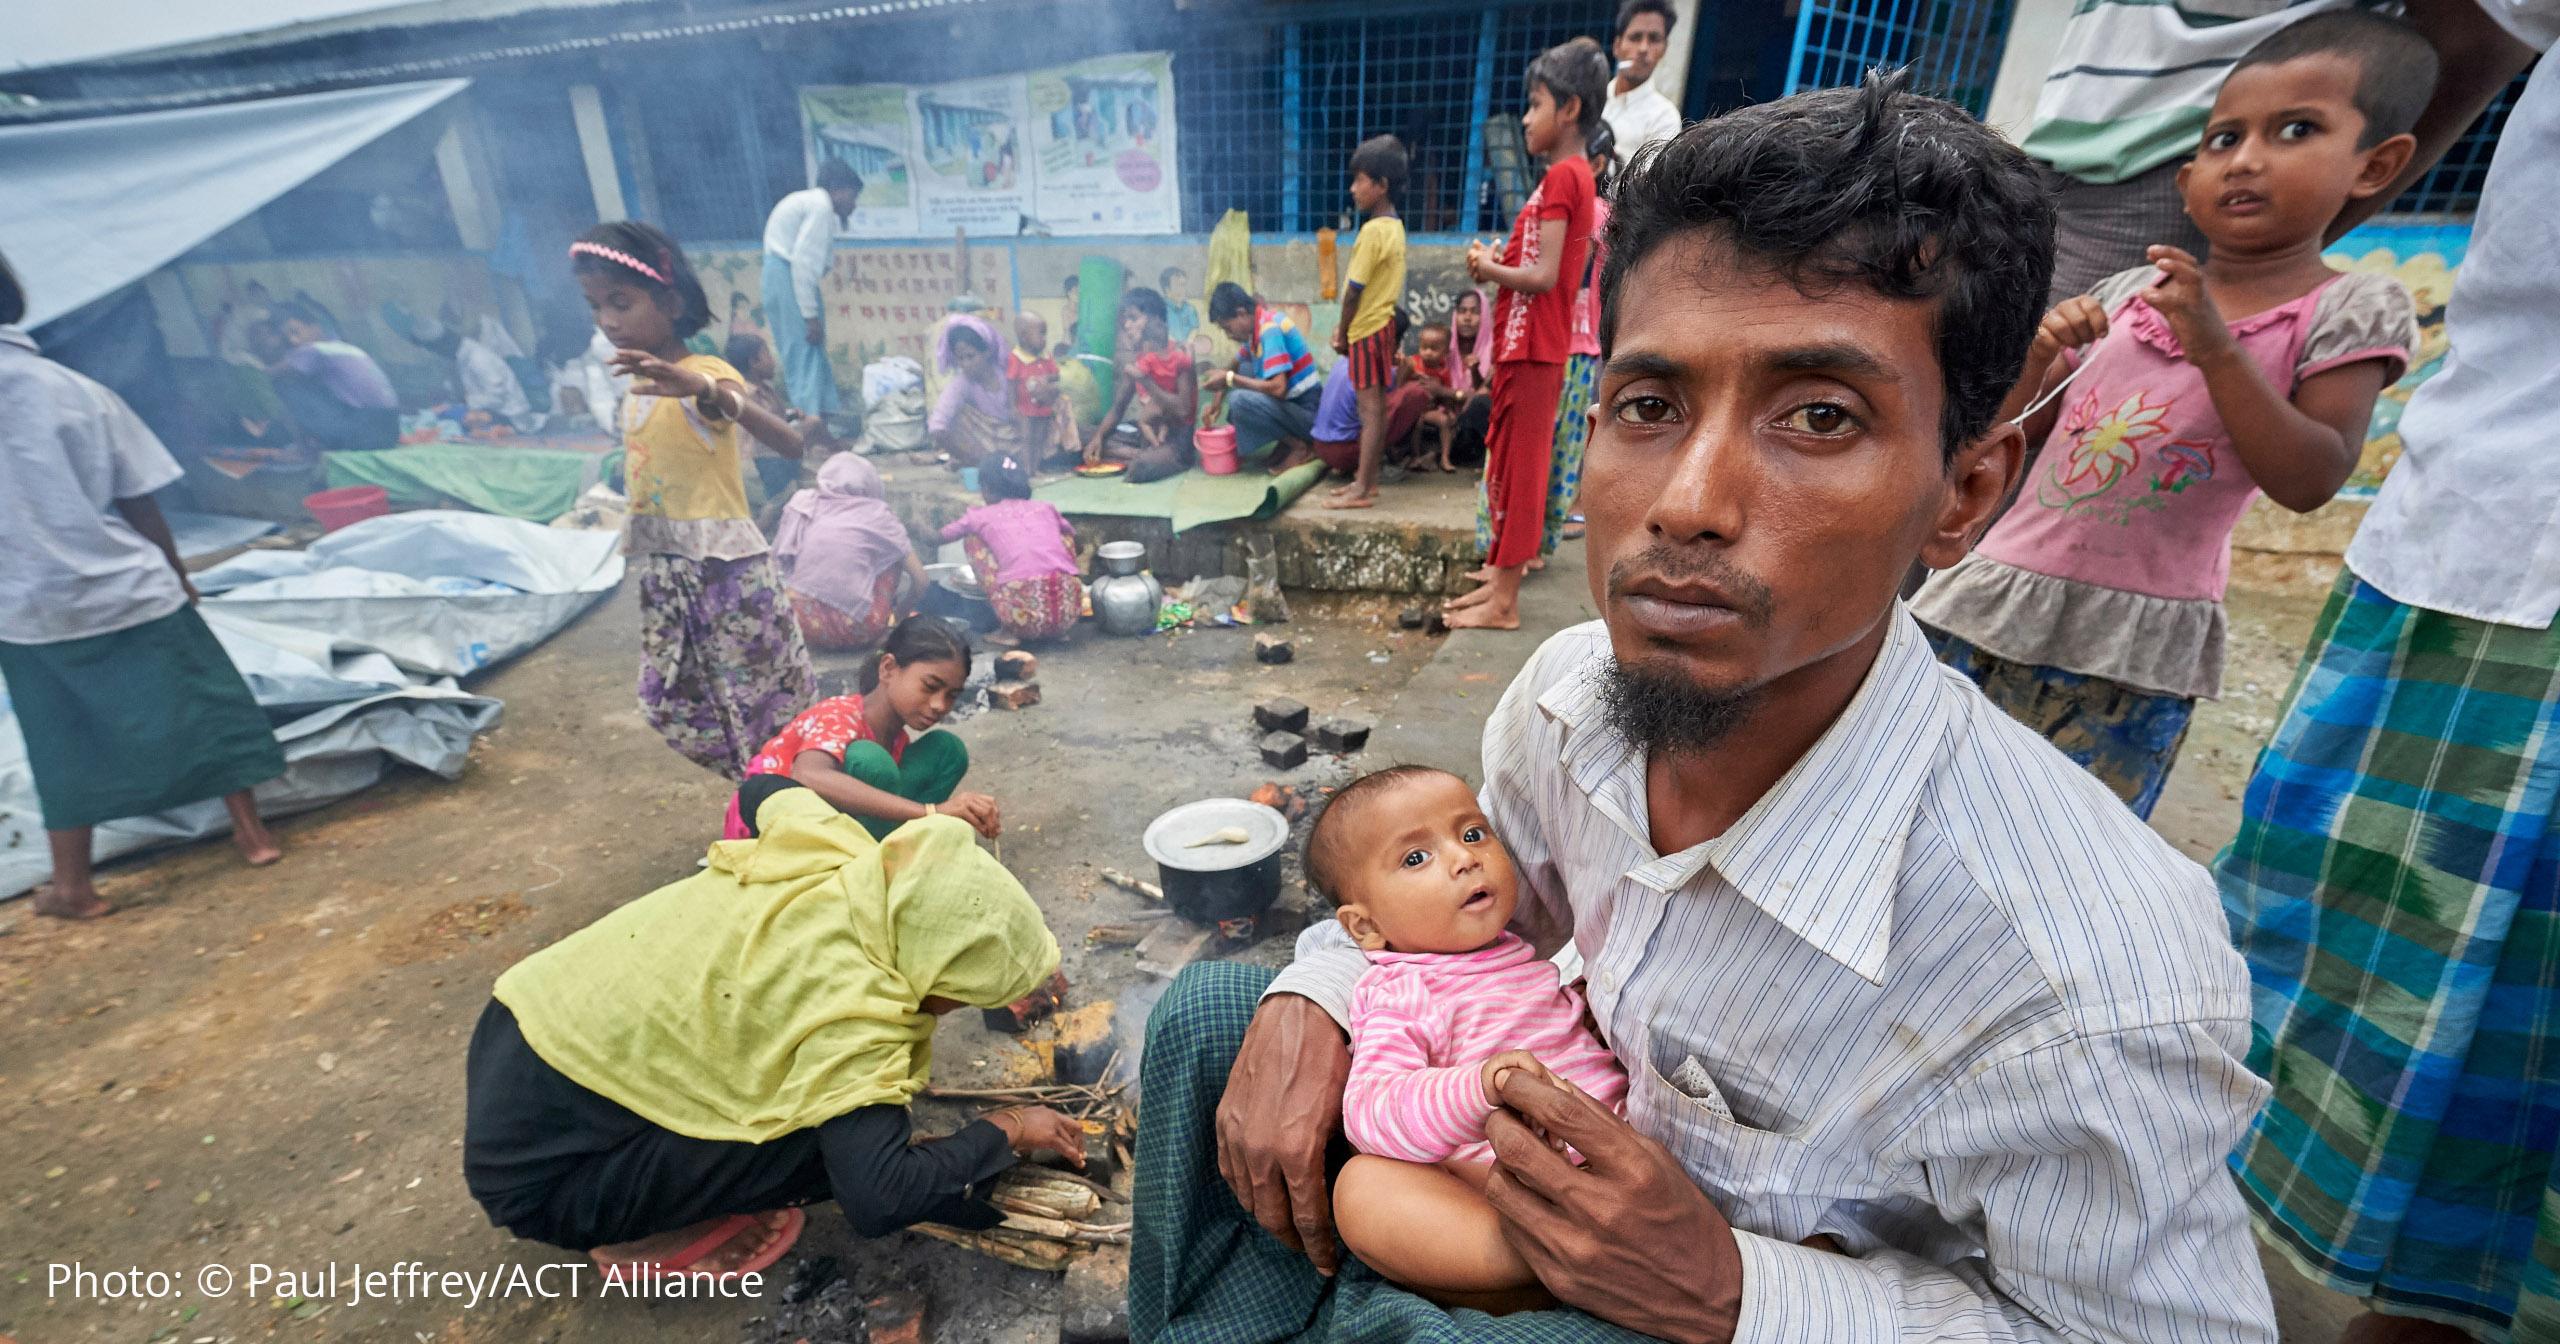 aide d 39 urgence pour les rohingyas victime de pers cutions r fugi s rohingyas au bangladesh. Black Bedroom Furniture Sets. Home Design Ideas